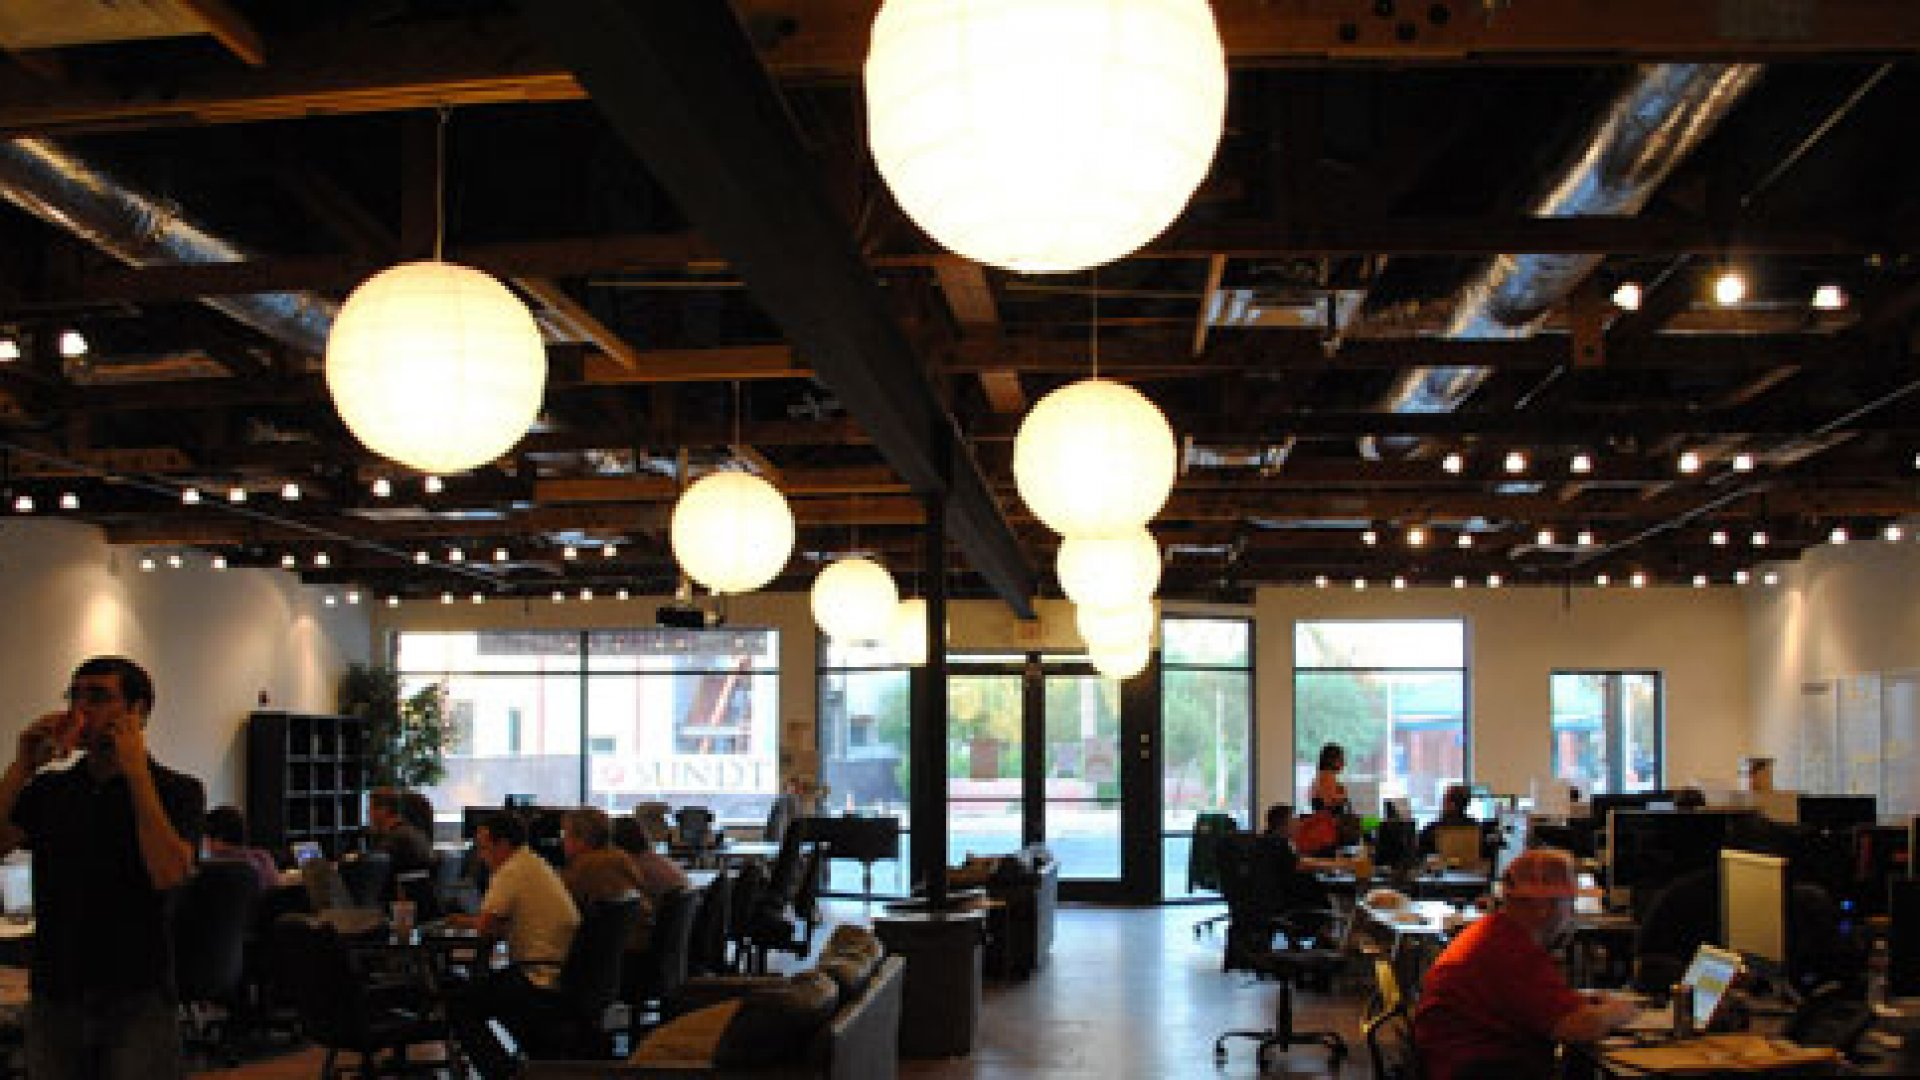 Gangplank co-working space in Chandler, Arizona.